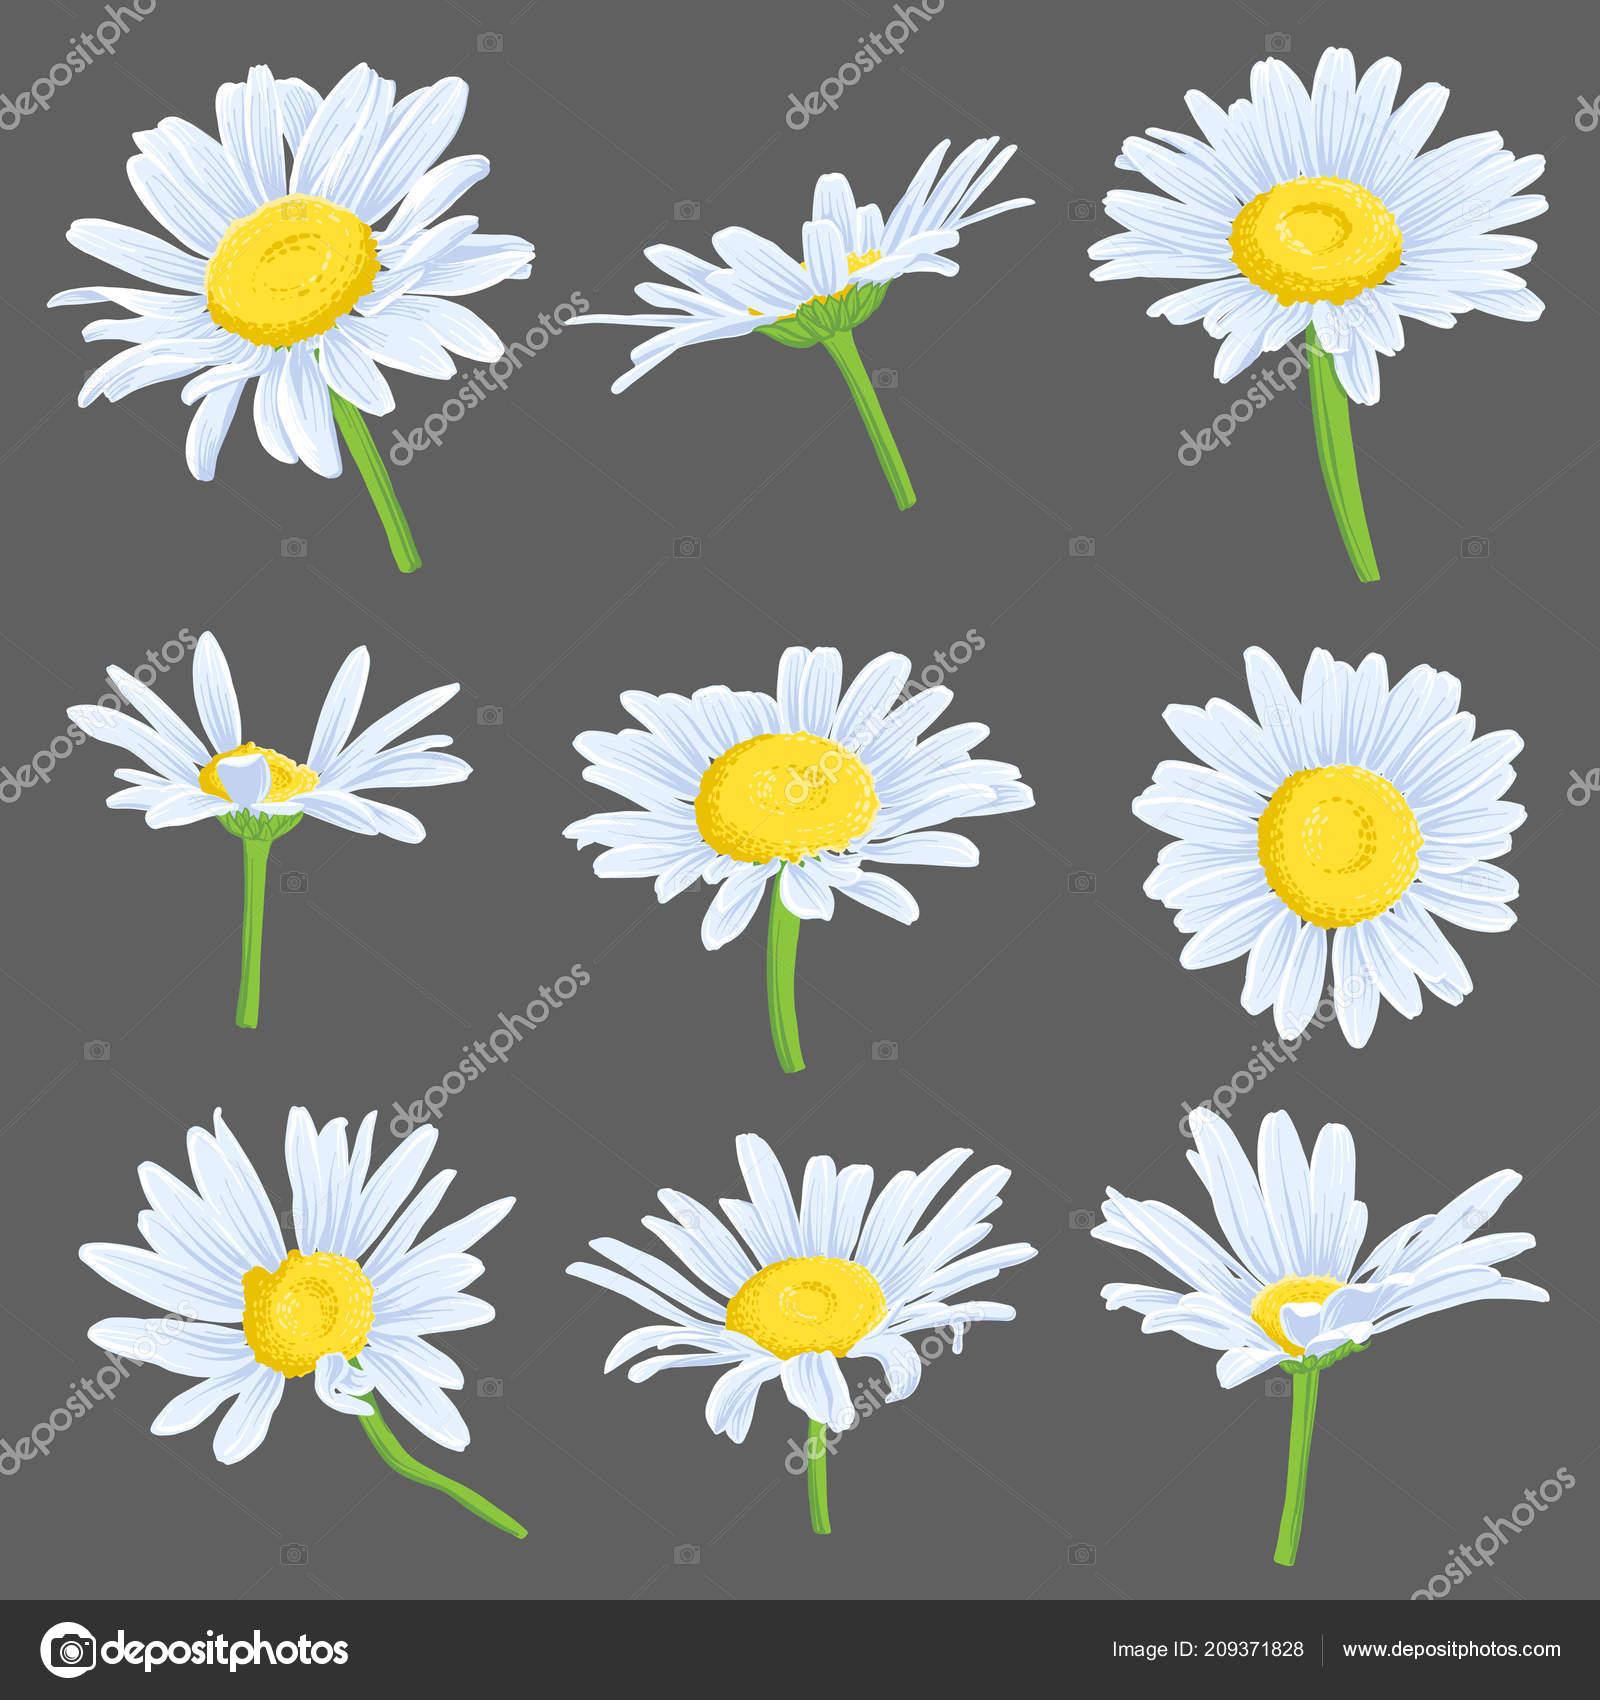 Vector Set Of Drawing Daisy Flowers Stock Vector Catarchangel